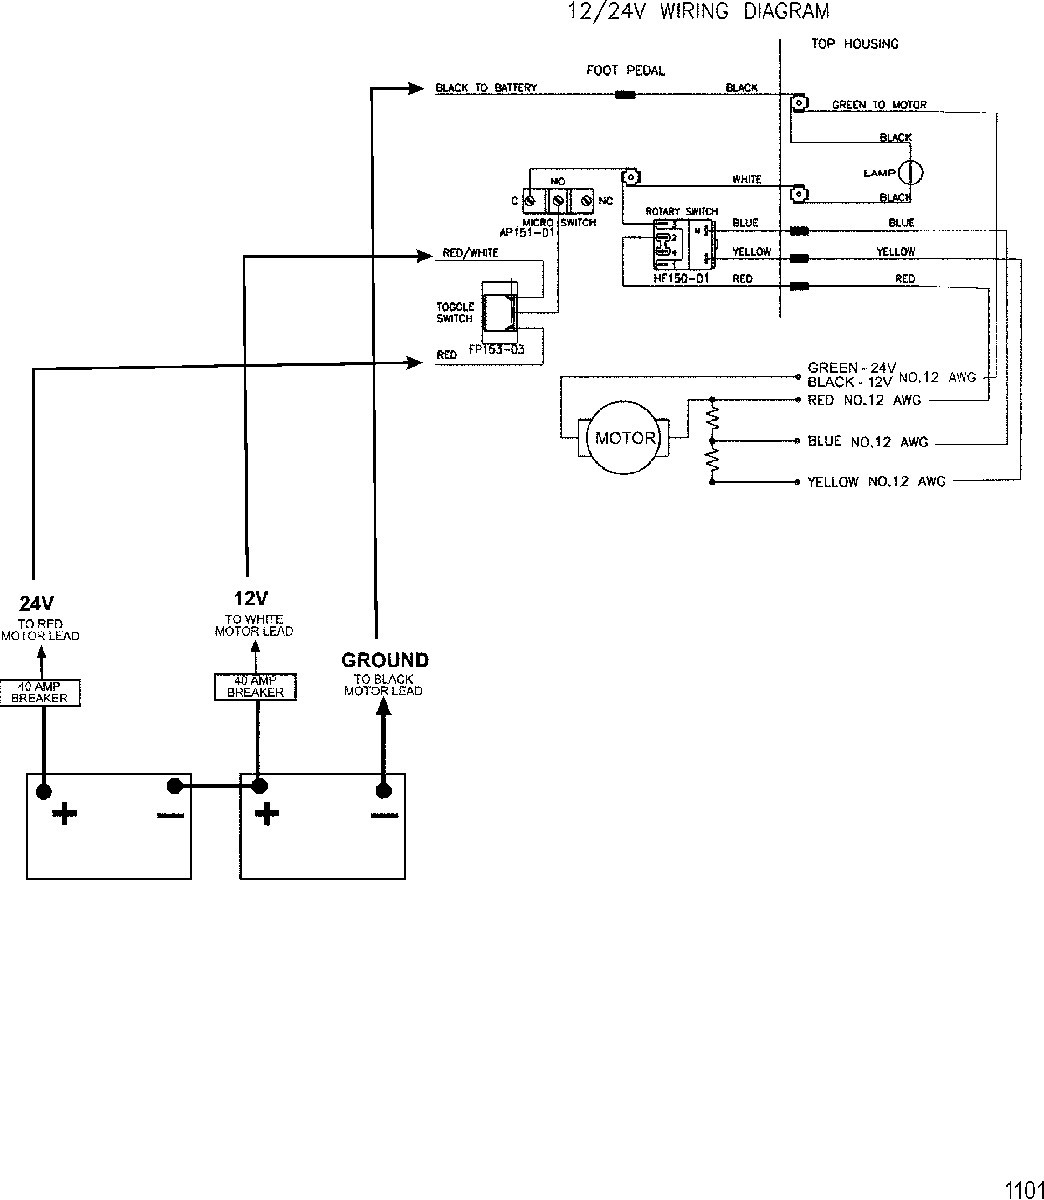 motorguide wireless wiring diagram    motorguide    trolling motor repair manual impremedia net     motorguide    trolling motor repair manual impremedia net